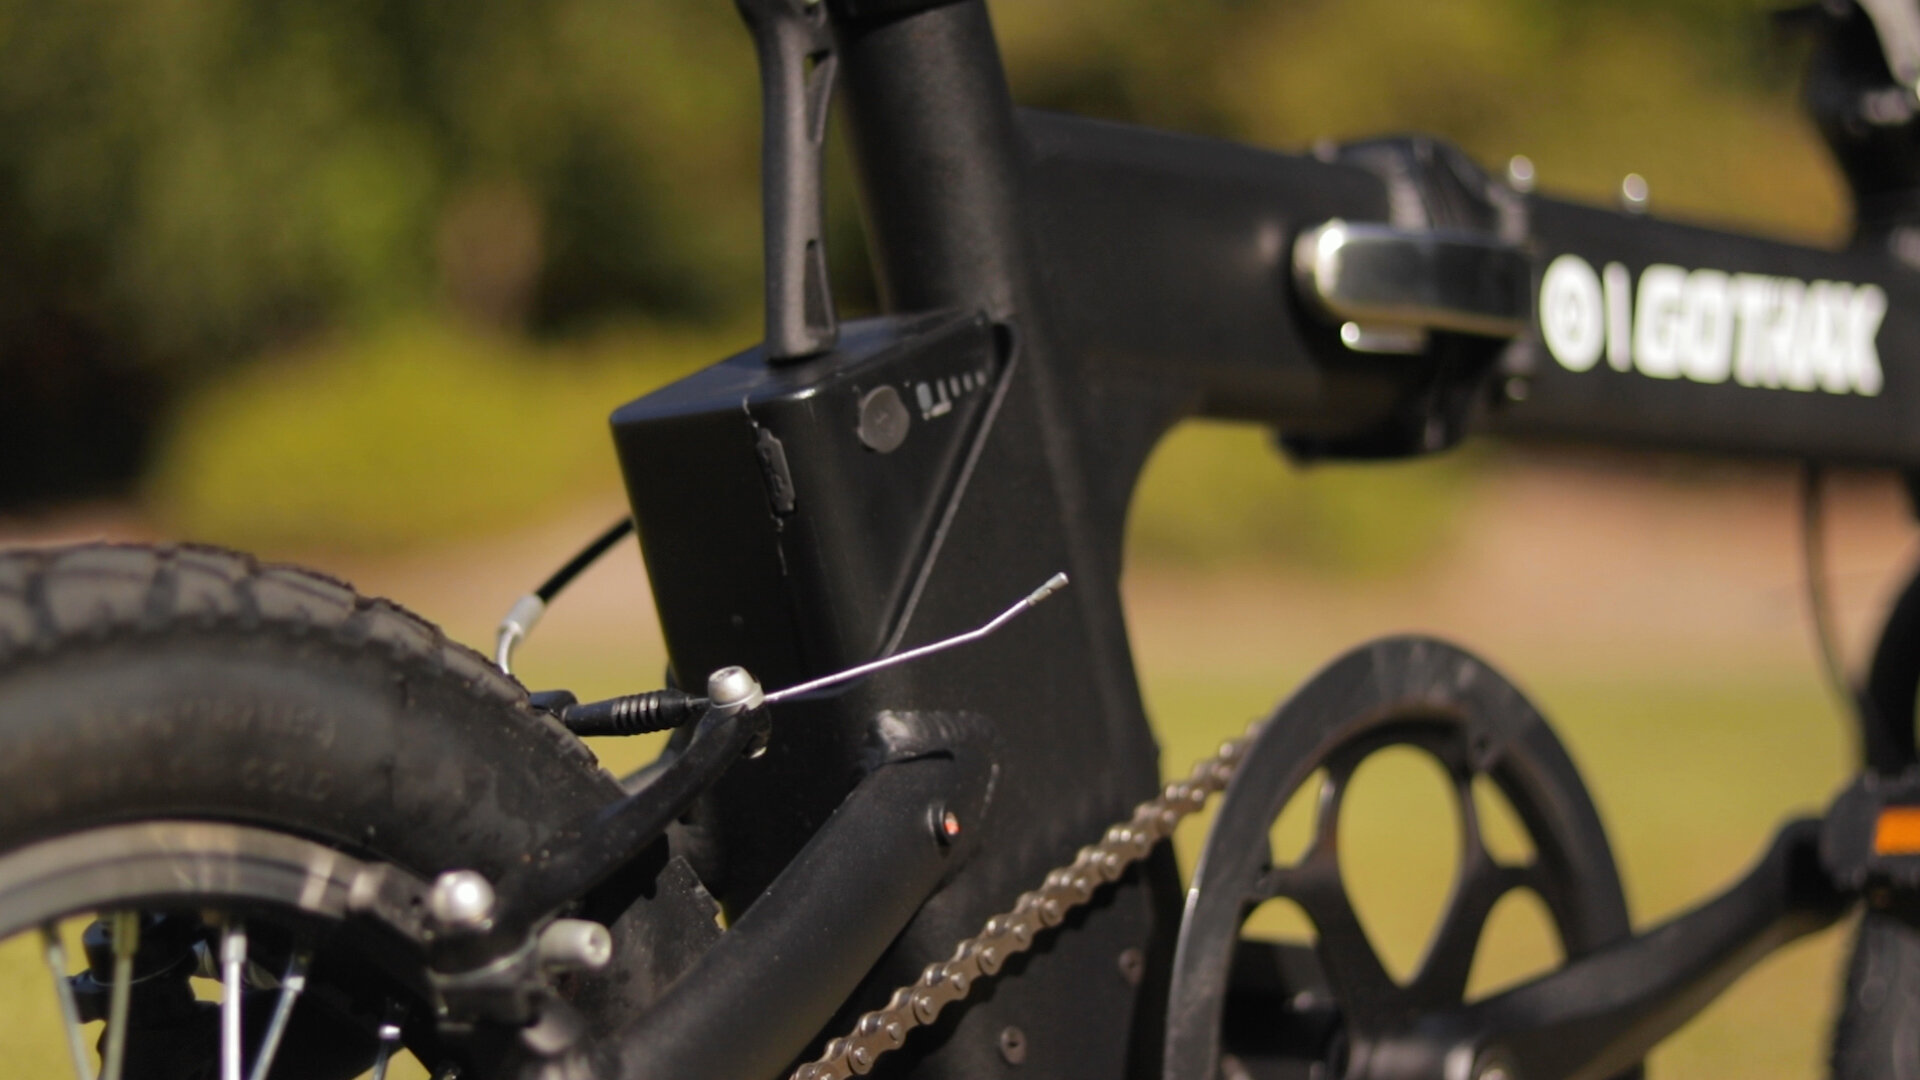 gotrax-shift-s1-electric-bike-review-2019-battery.jpg